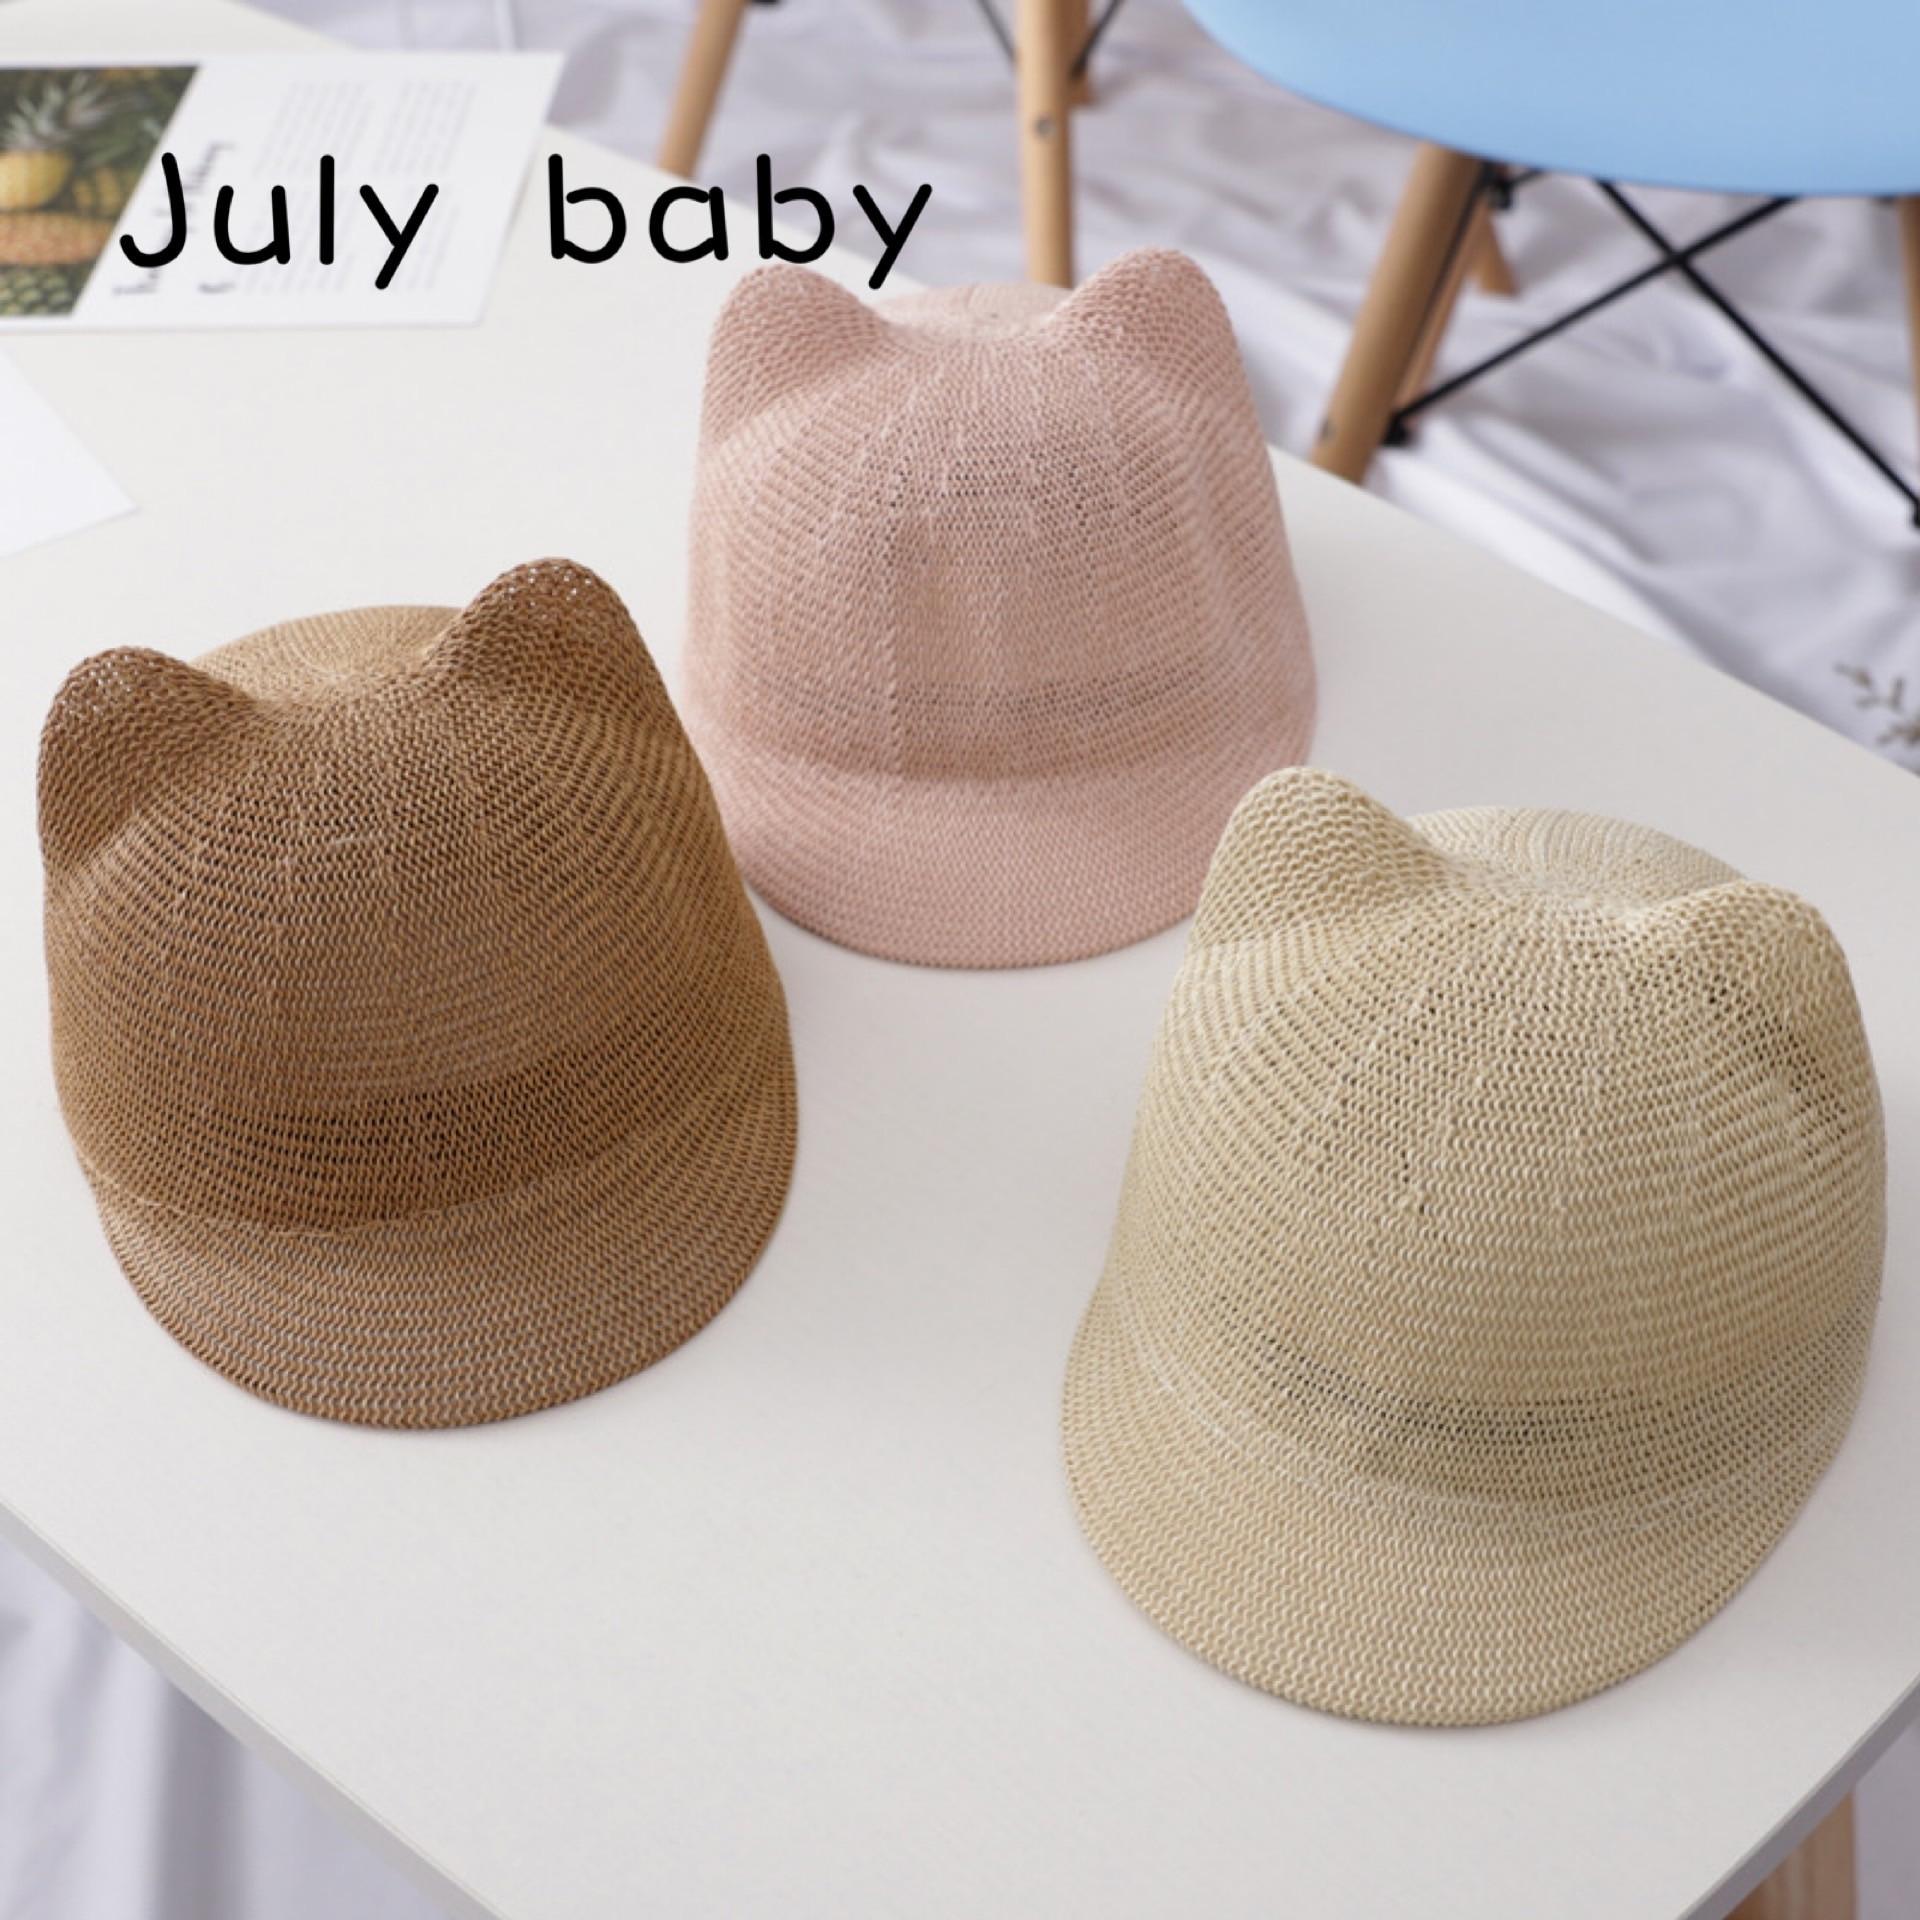 July Baby Children's Hat Male Korean Version Summer Baby Cap Girl Sunscreen Hat Travel Sunscreen Sunscreen Hat Breathable Straw